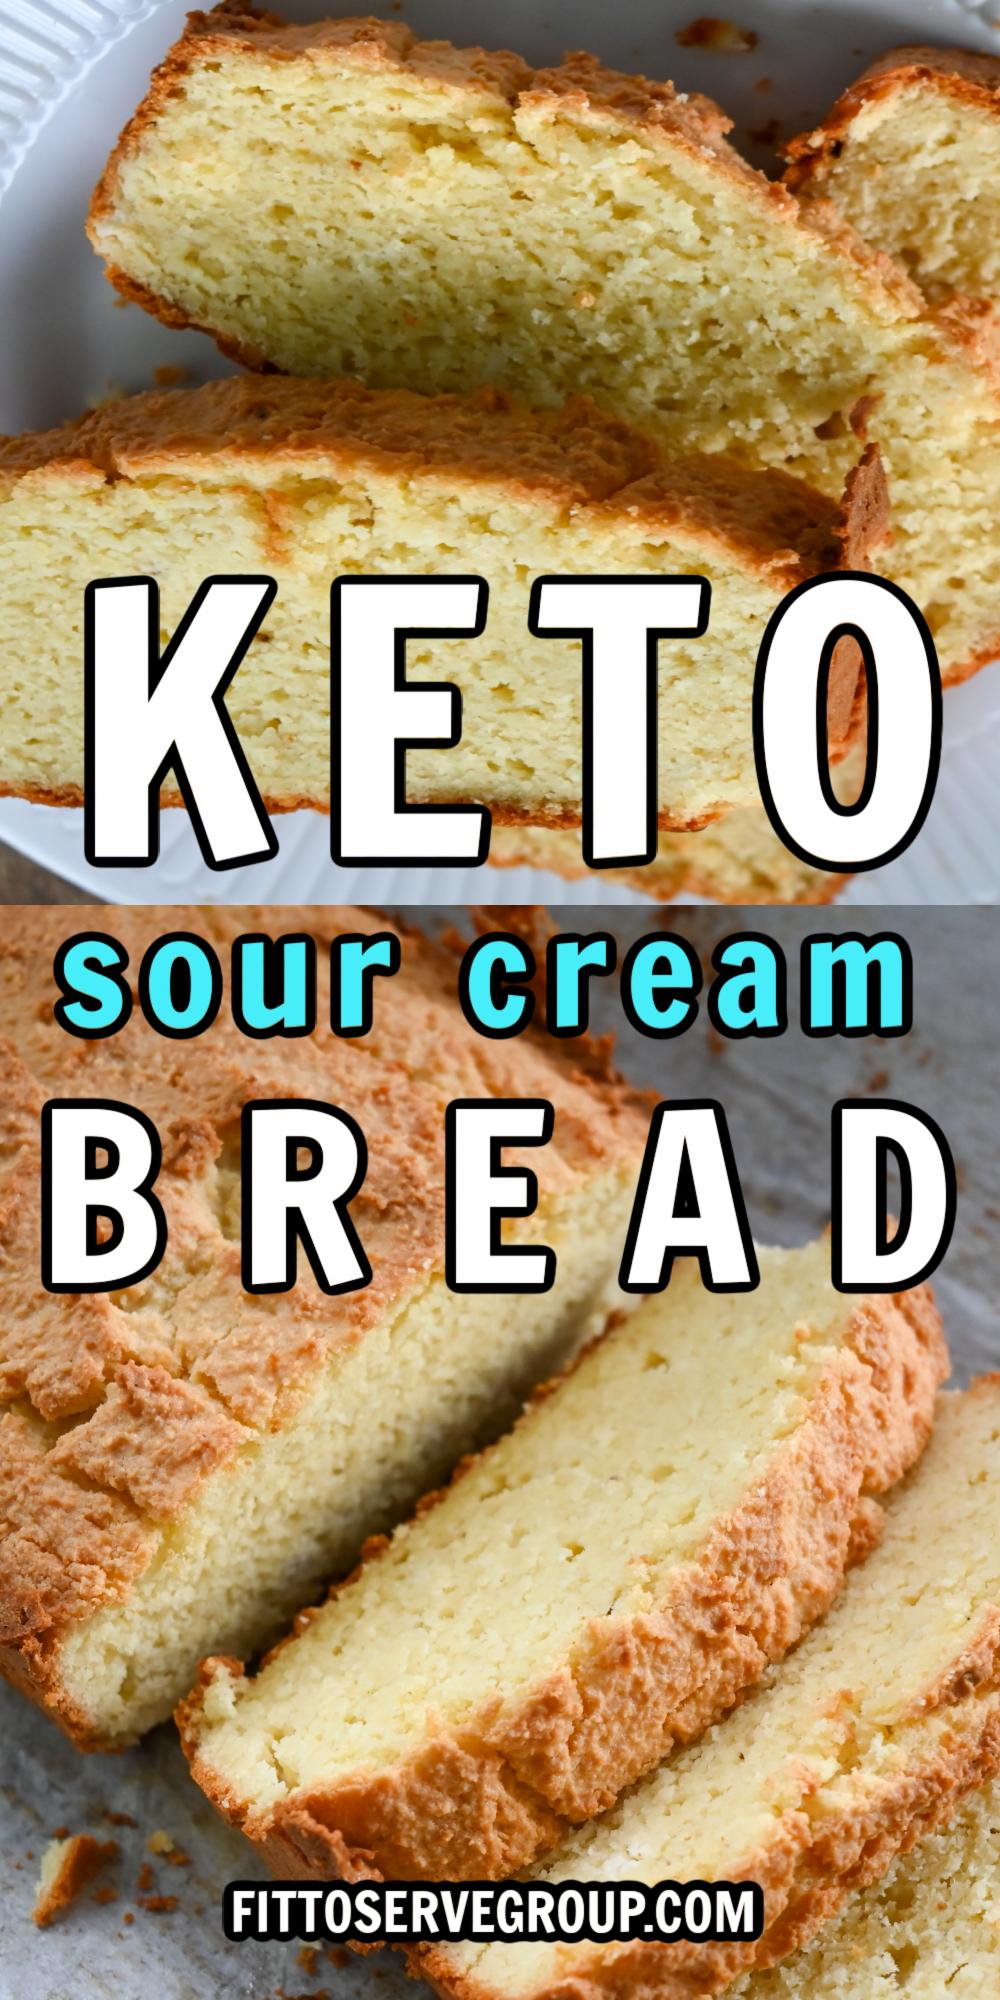 Keto Sour Cream Gluten-Free Bread sliced and served